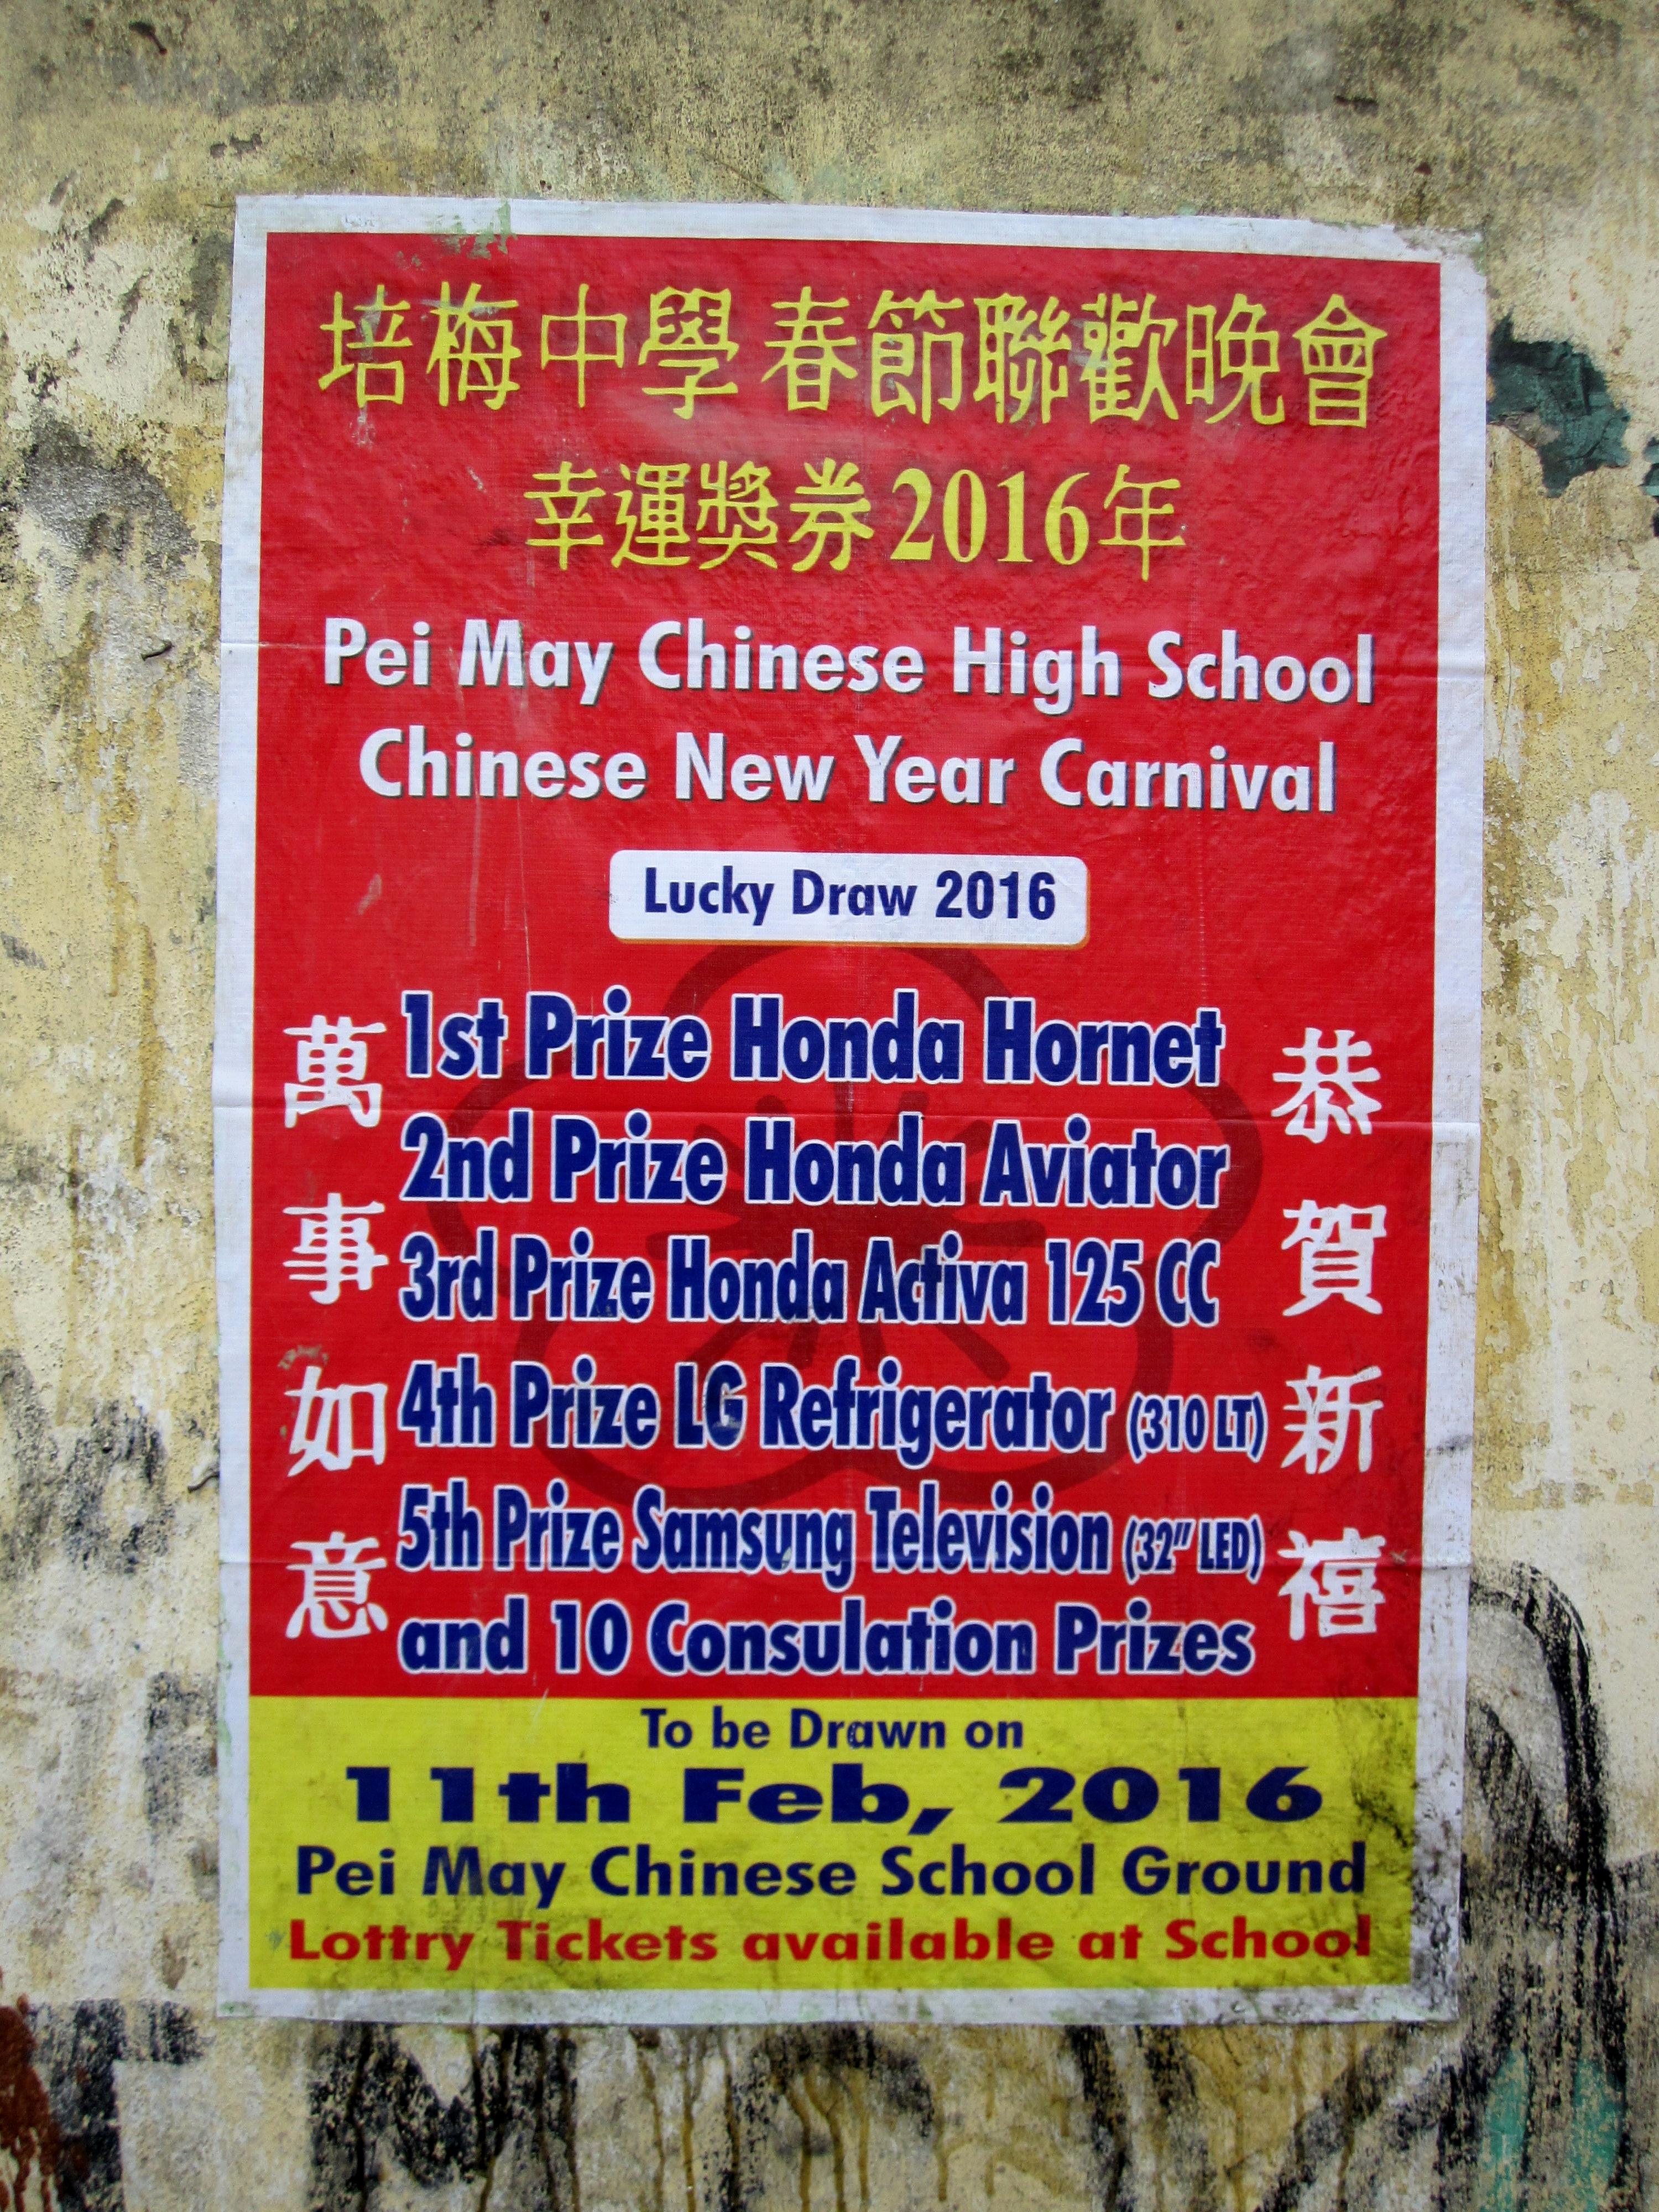 Kinesiskt lotteri. ©Zac O'Yeah